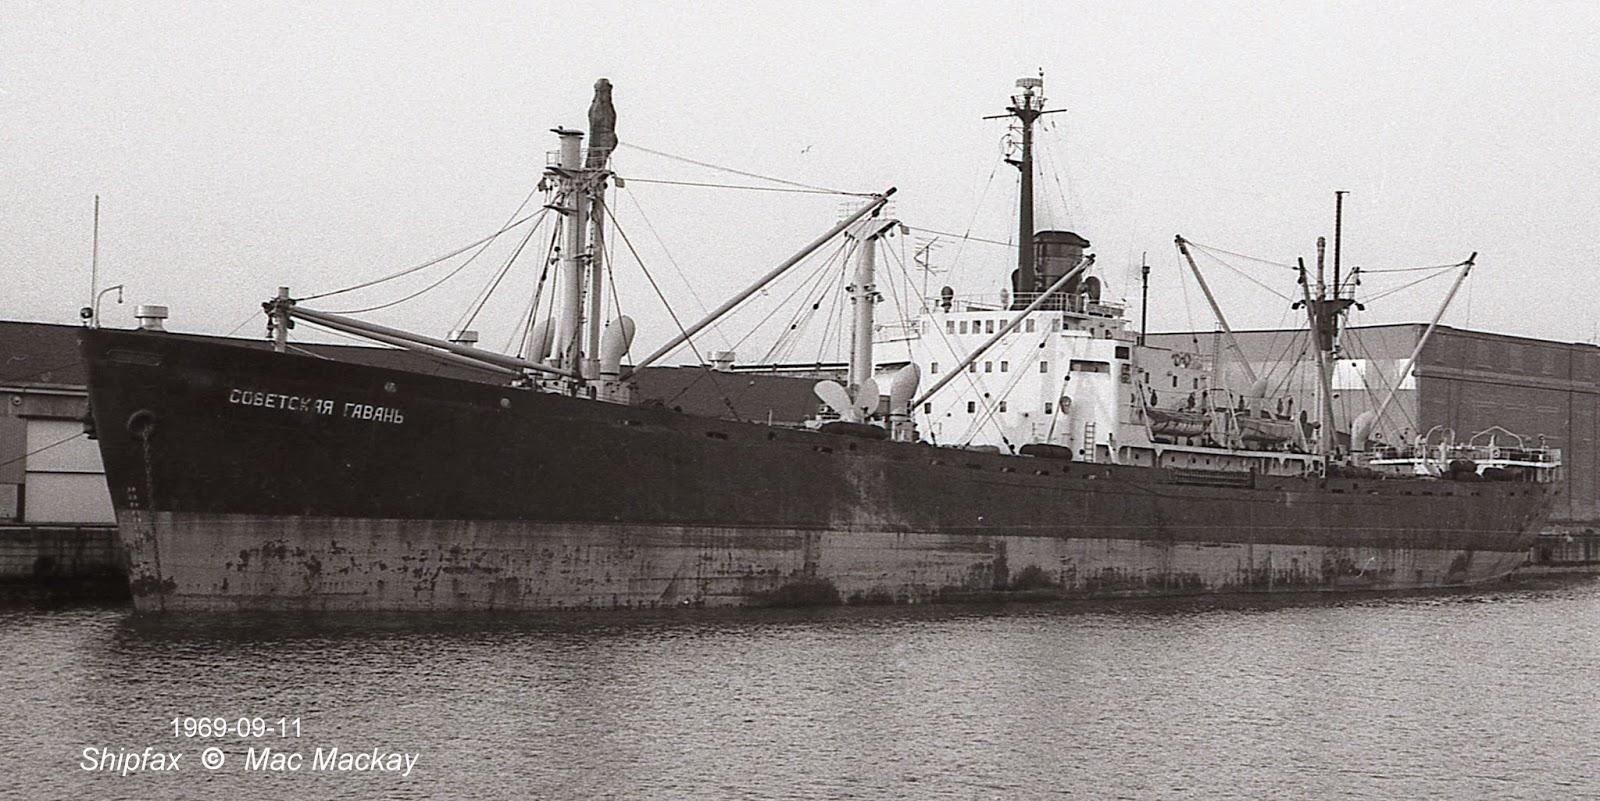 Shipfax Ussr Flour Boats Part 2